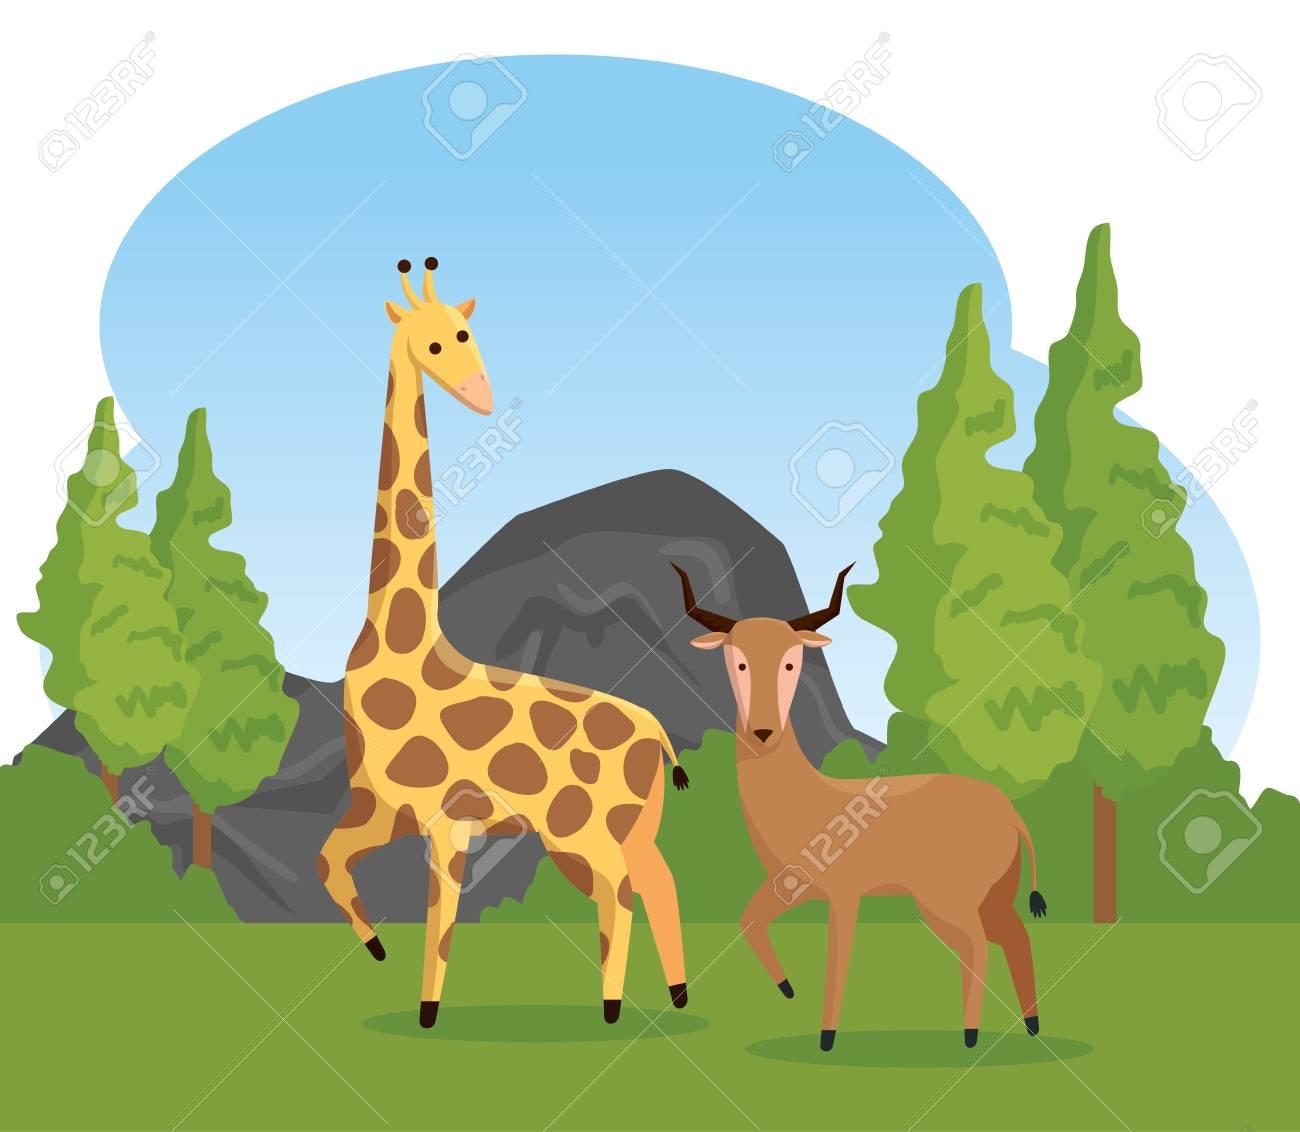 https://previews.123rf.com/images/yupiramos/yupiramos1902/yupiramos190207781/125257470-giraffe-and-deer-wild-animals-with-trees-vector-illustration.jpg